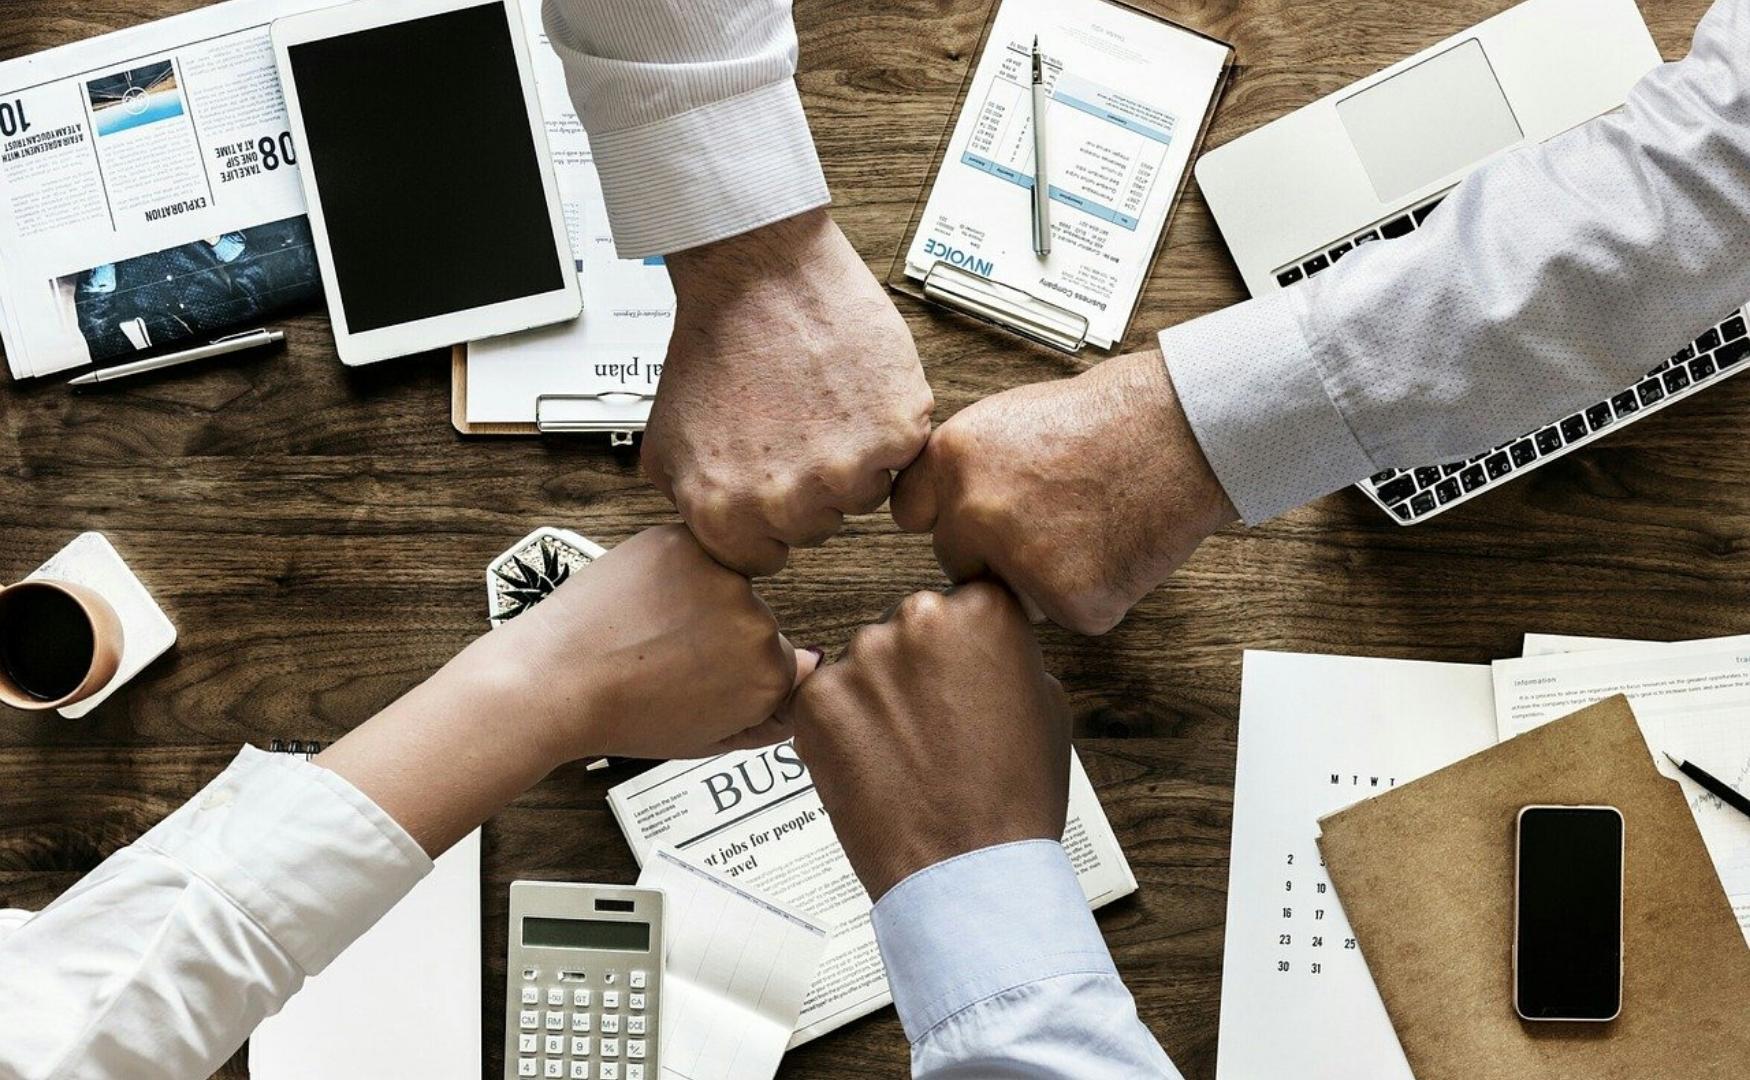 COmunicacion eficaz en al pequeña empresa